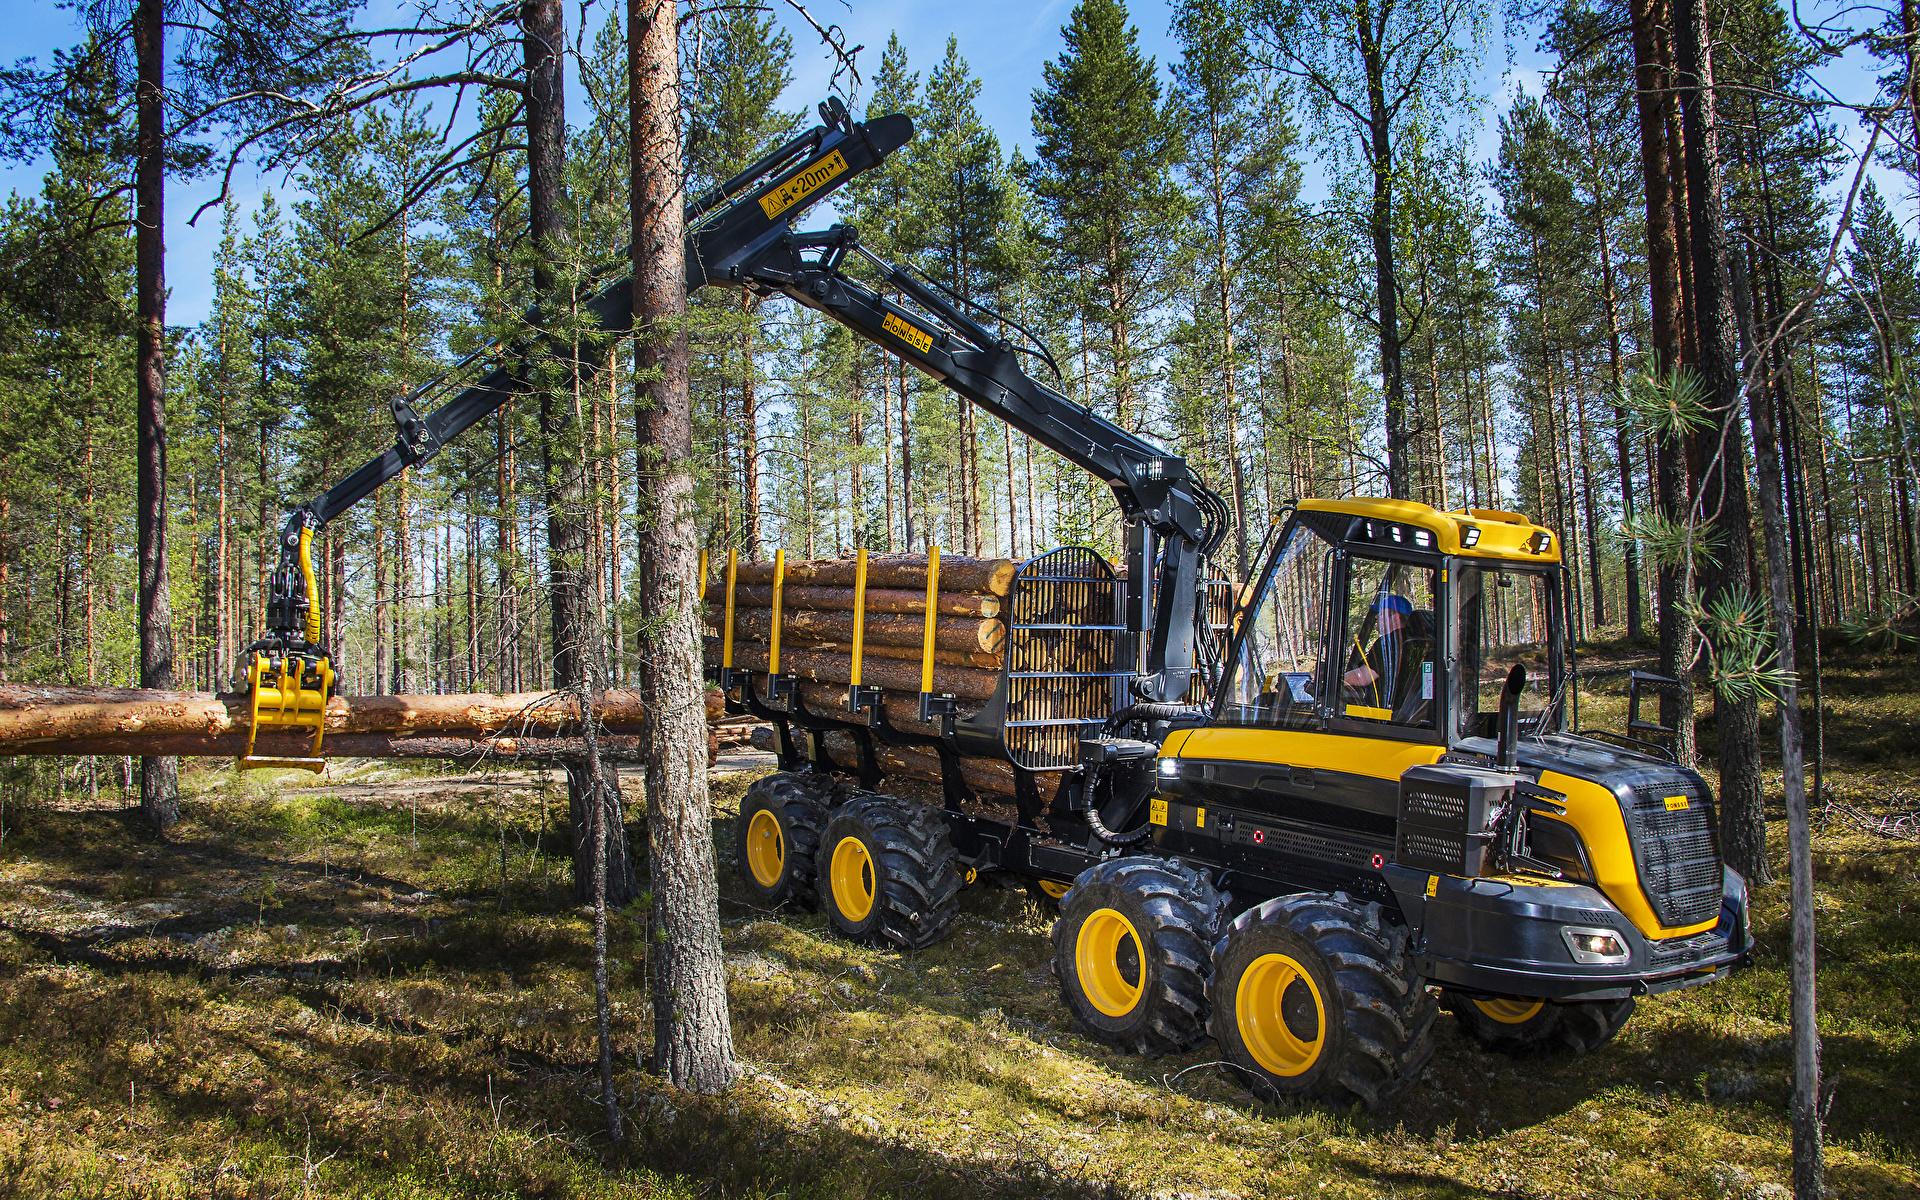 Фотографии Форвардер 2014-17 Ponsse Wisent 8w бревно лес 1920x1200 Бревна Леса